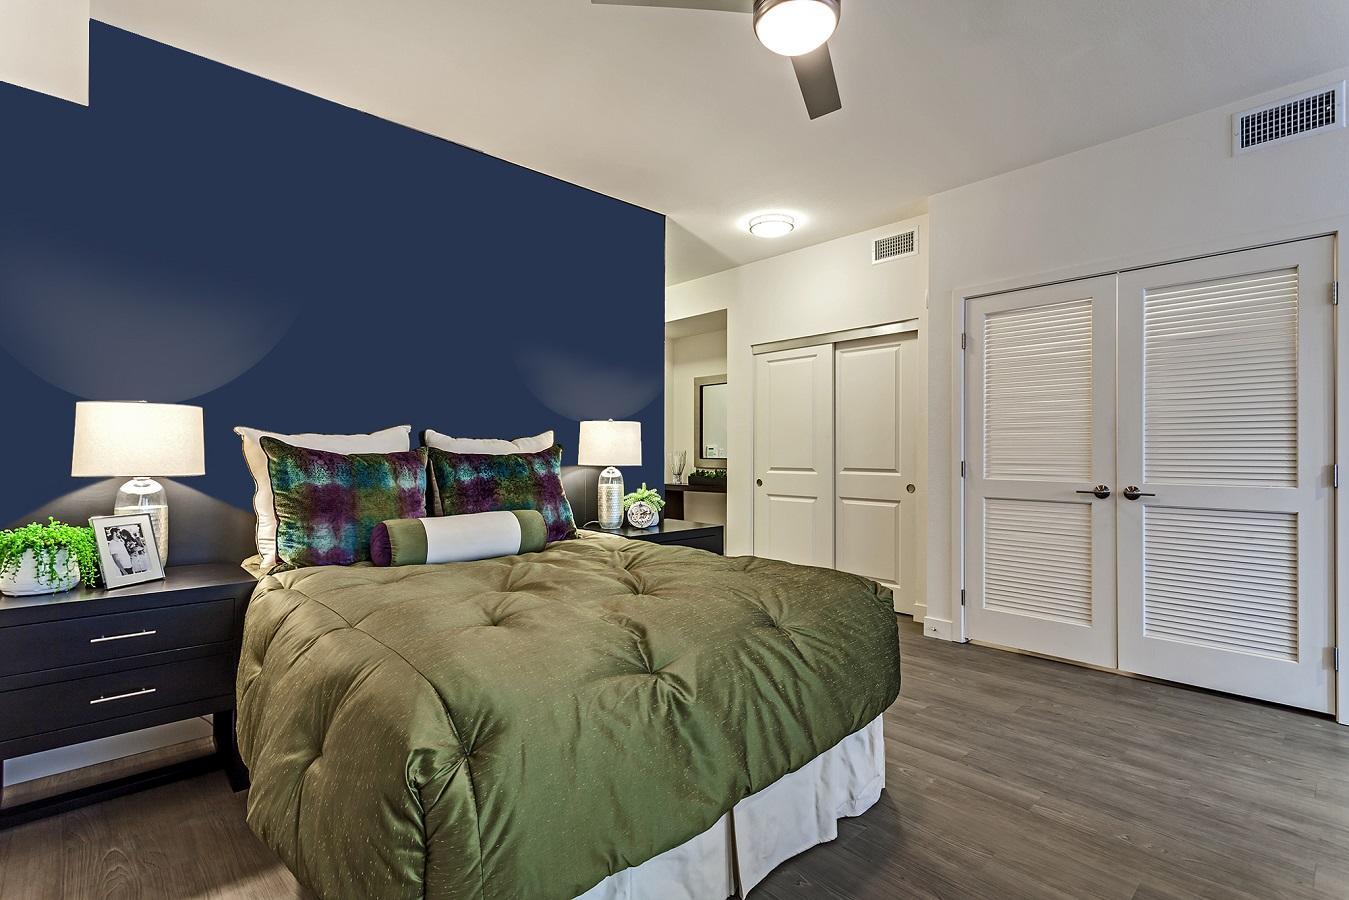 Camden Glendale Apartments